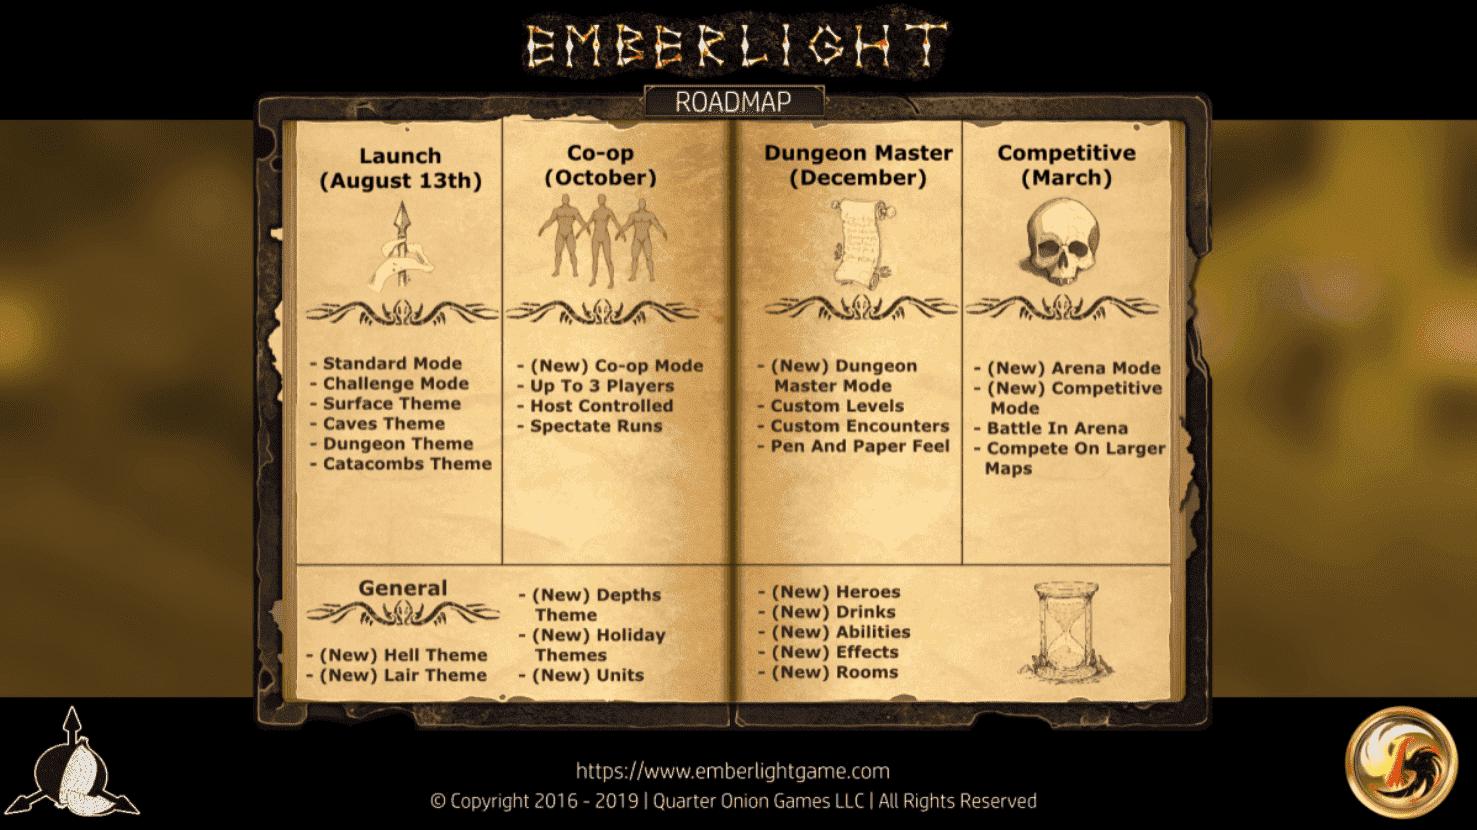 Roadmap Emberlight